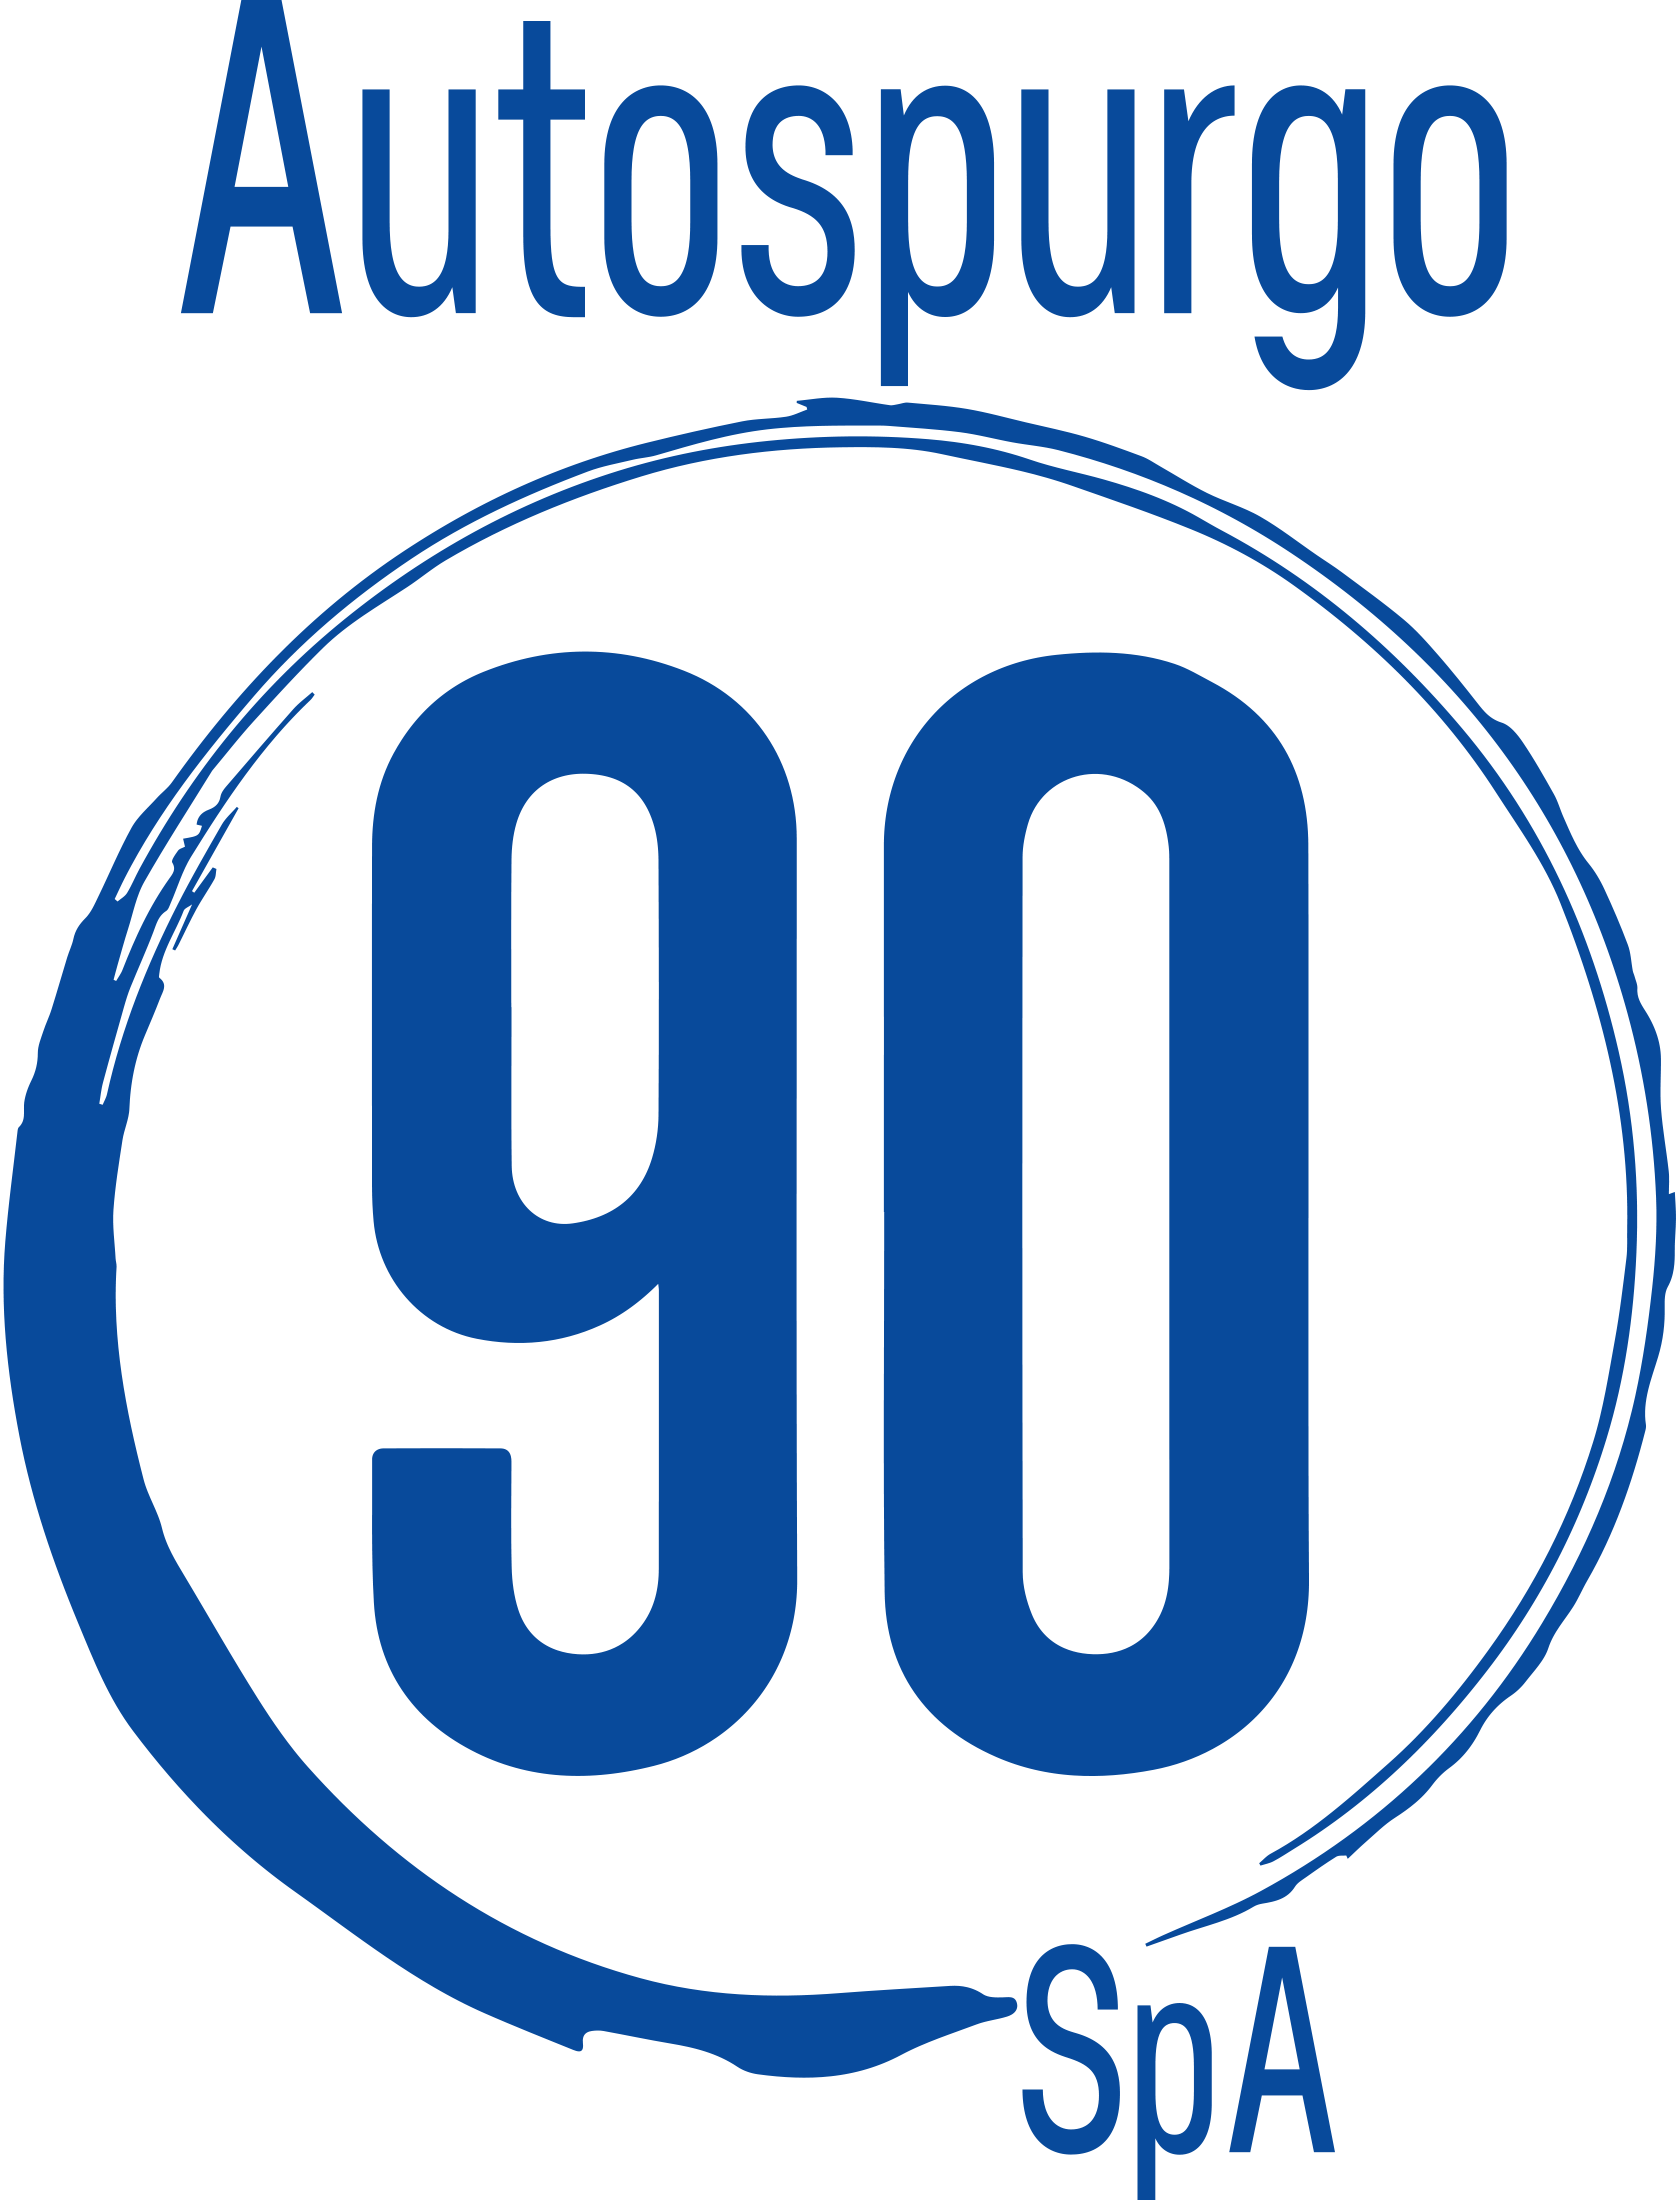 Autospurgo90